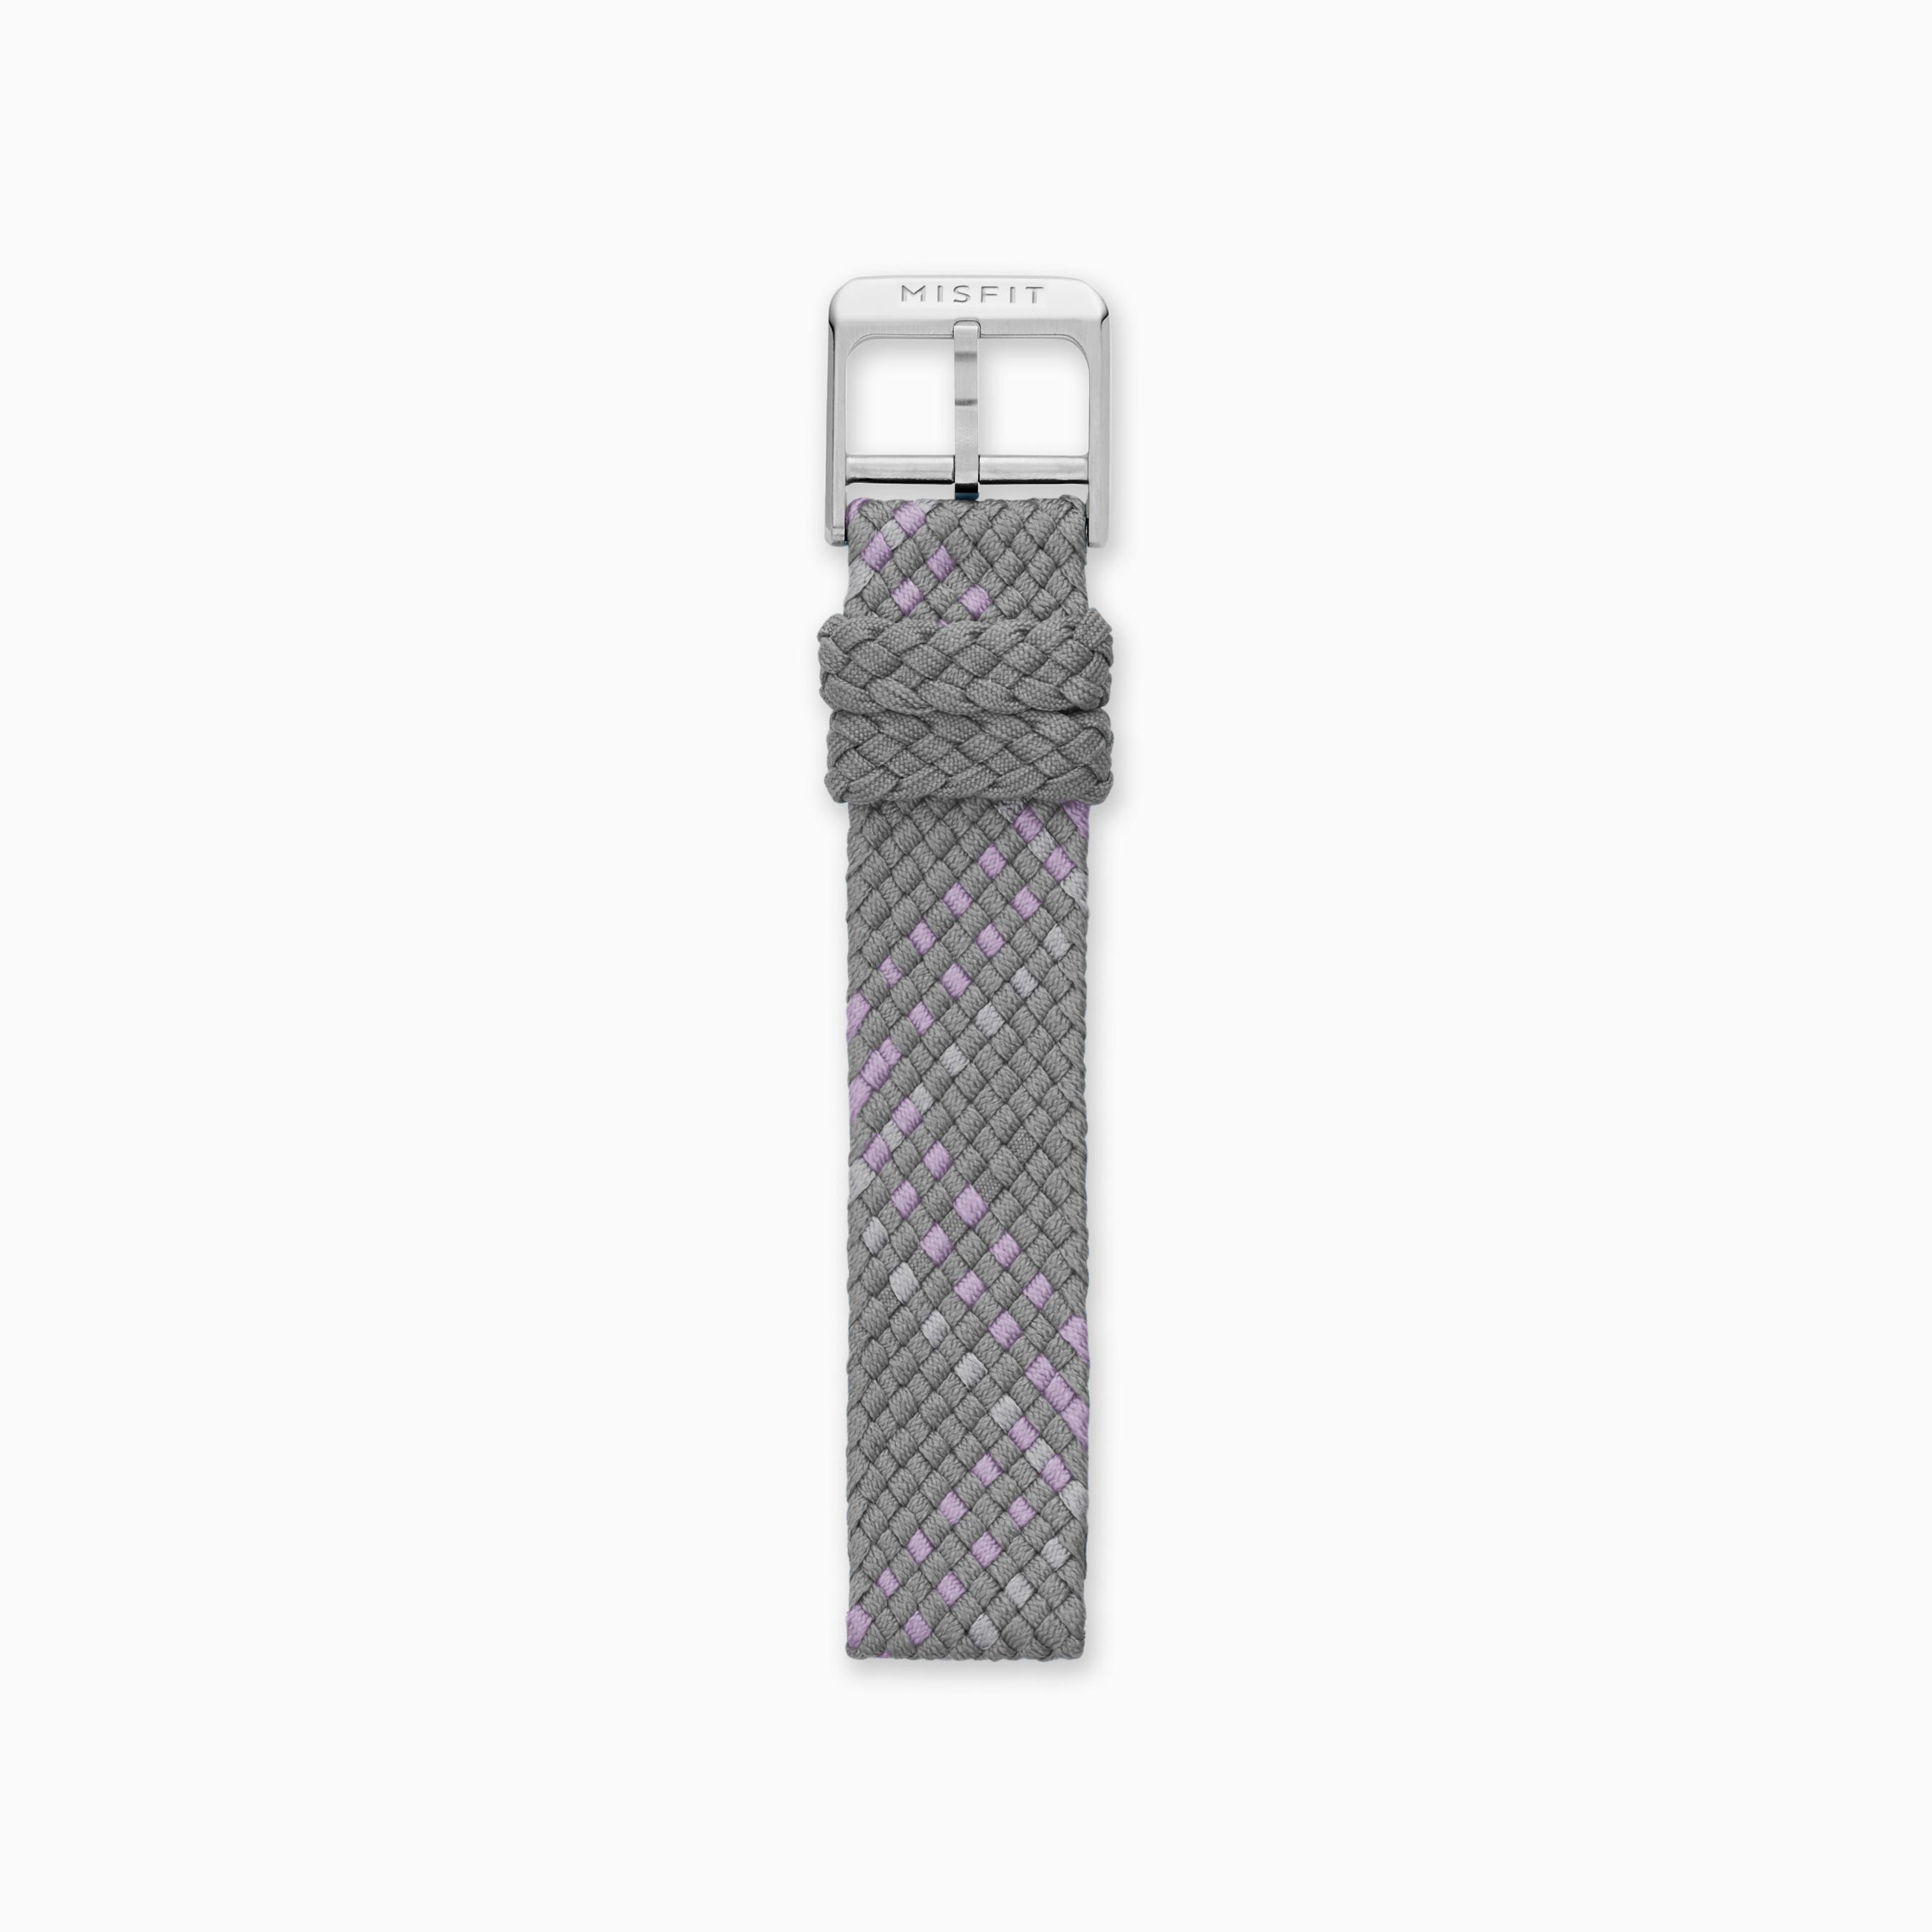 16mm Misfit Smartwatch Nylon Strap